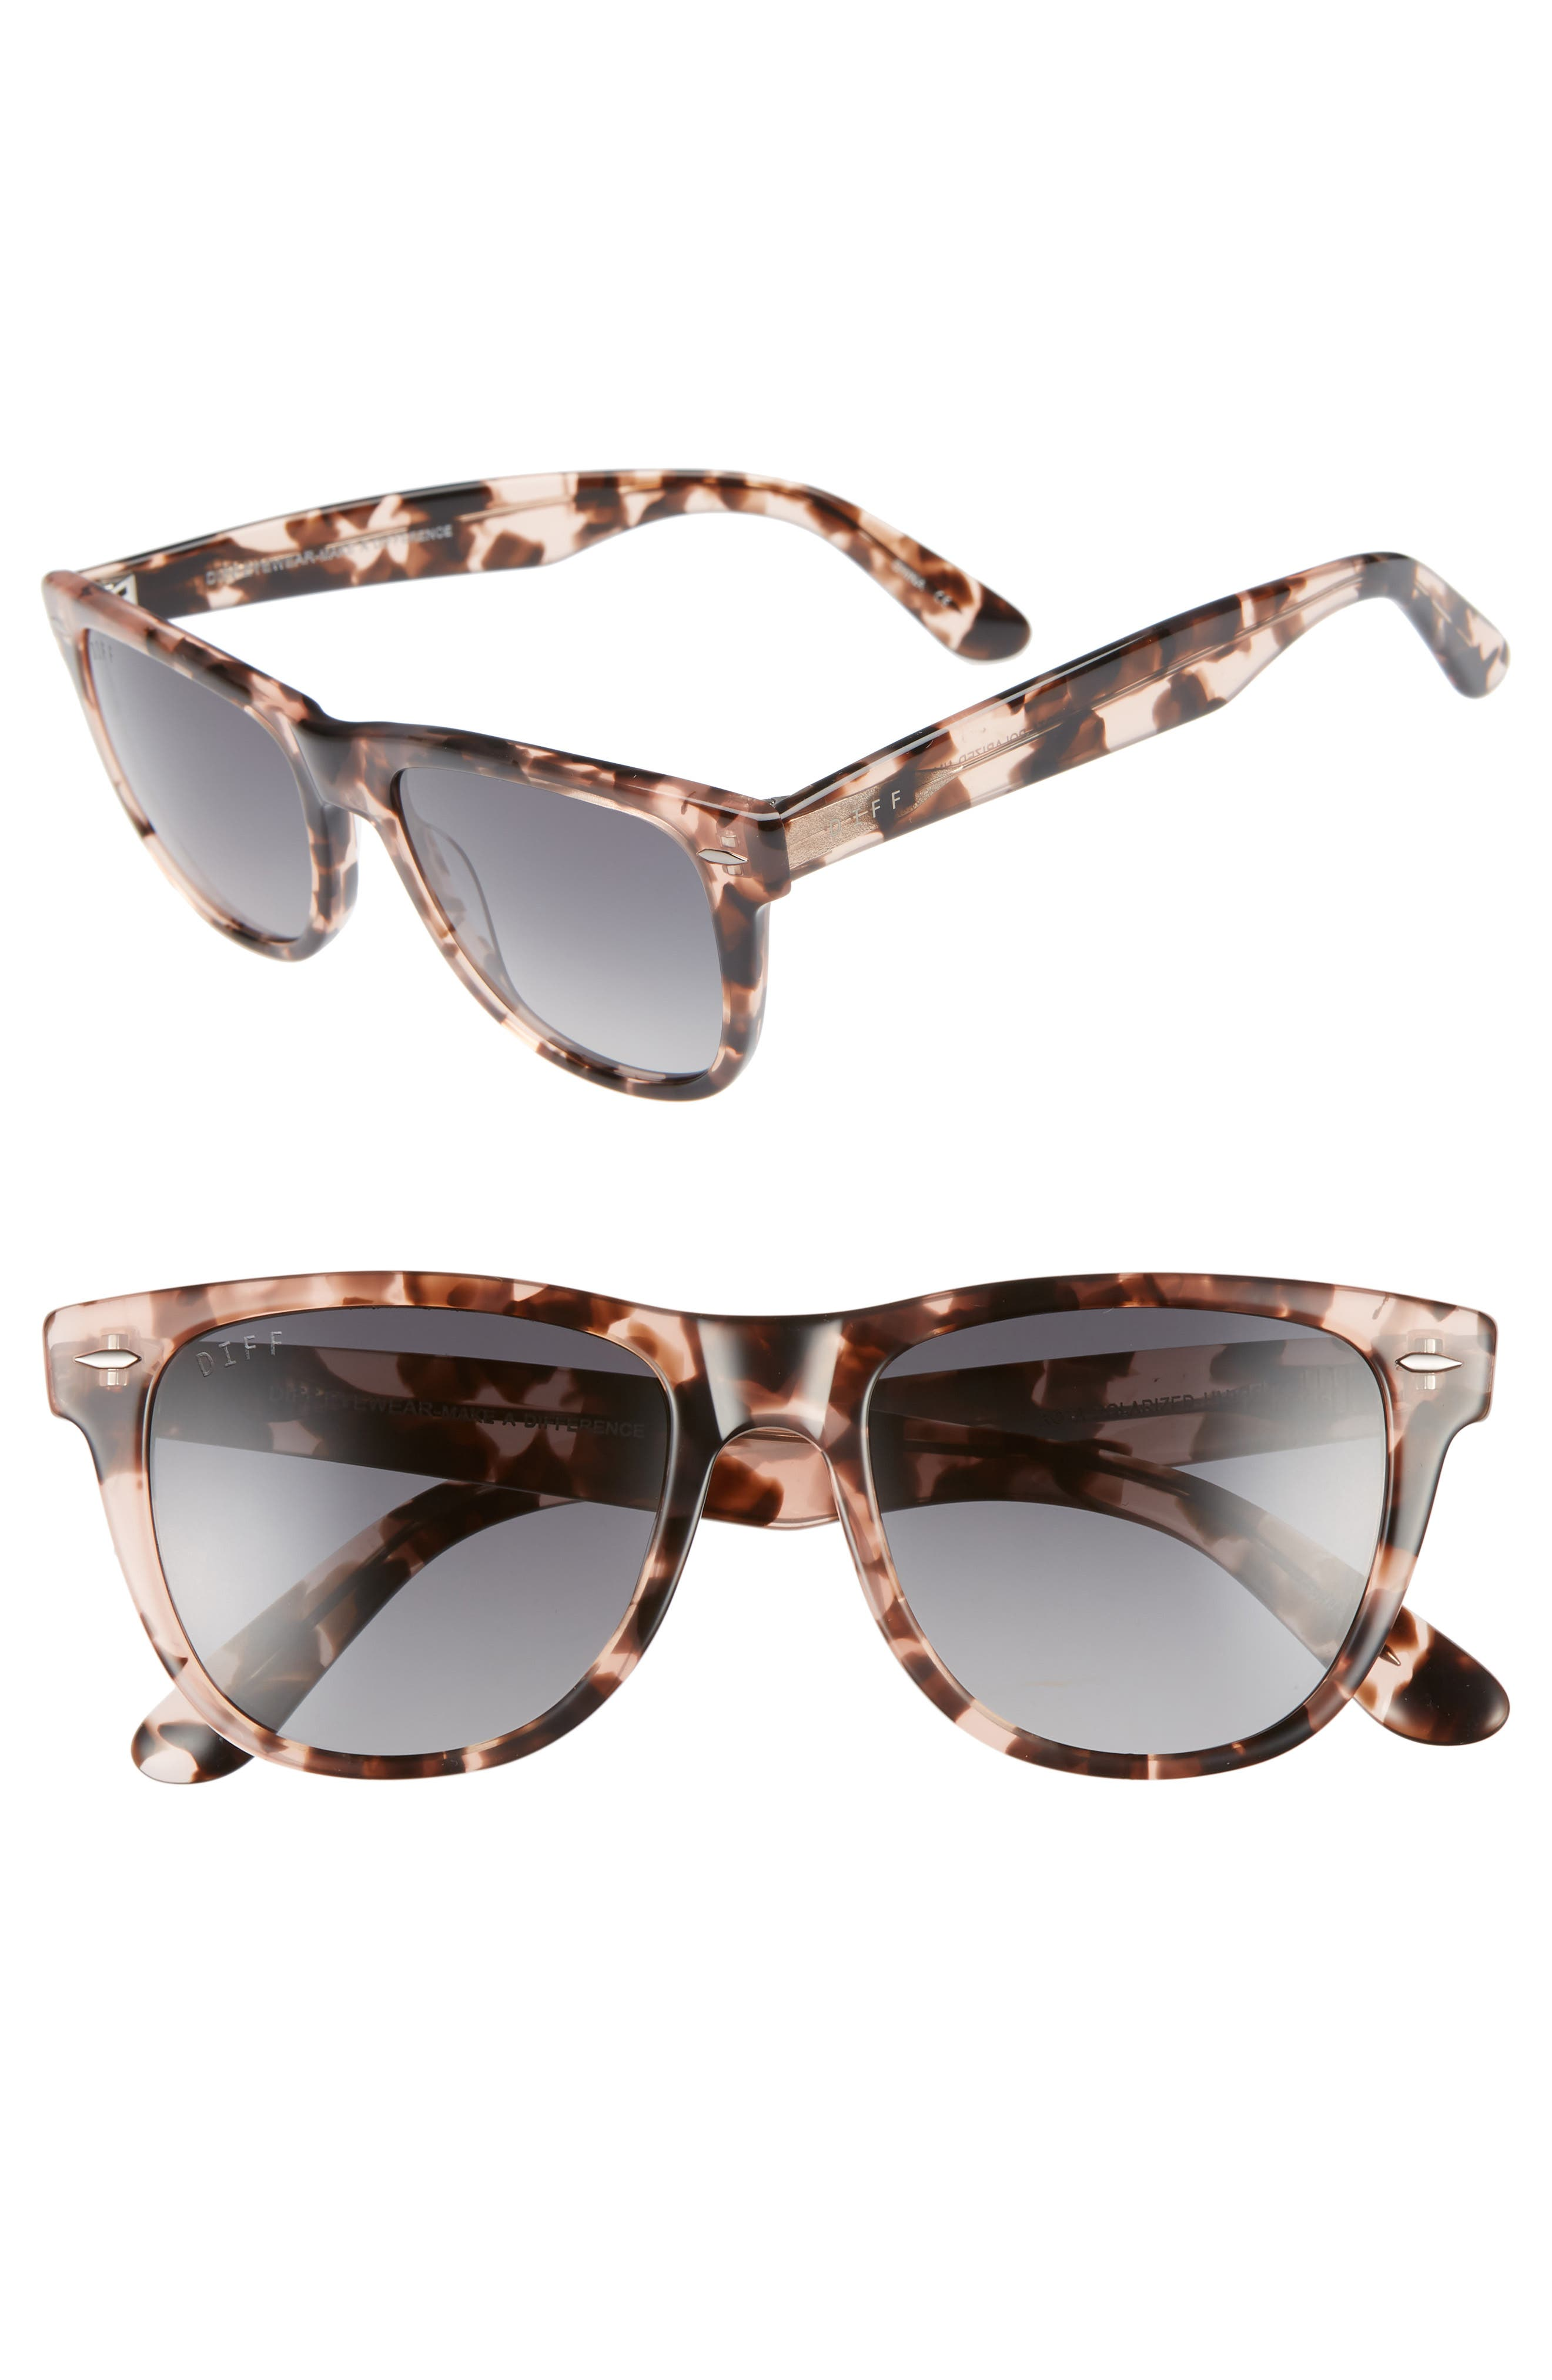 Kota 51mm Gradient Polarized Cat Eye Sunglasses,                         Main,                         color, HIMALYAN/ GREY